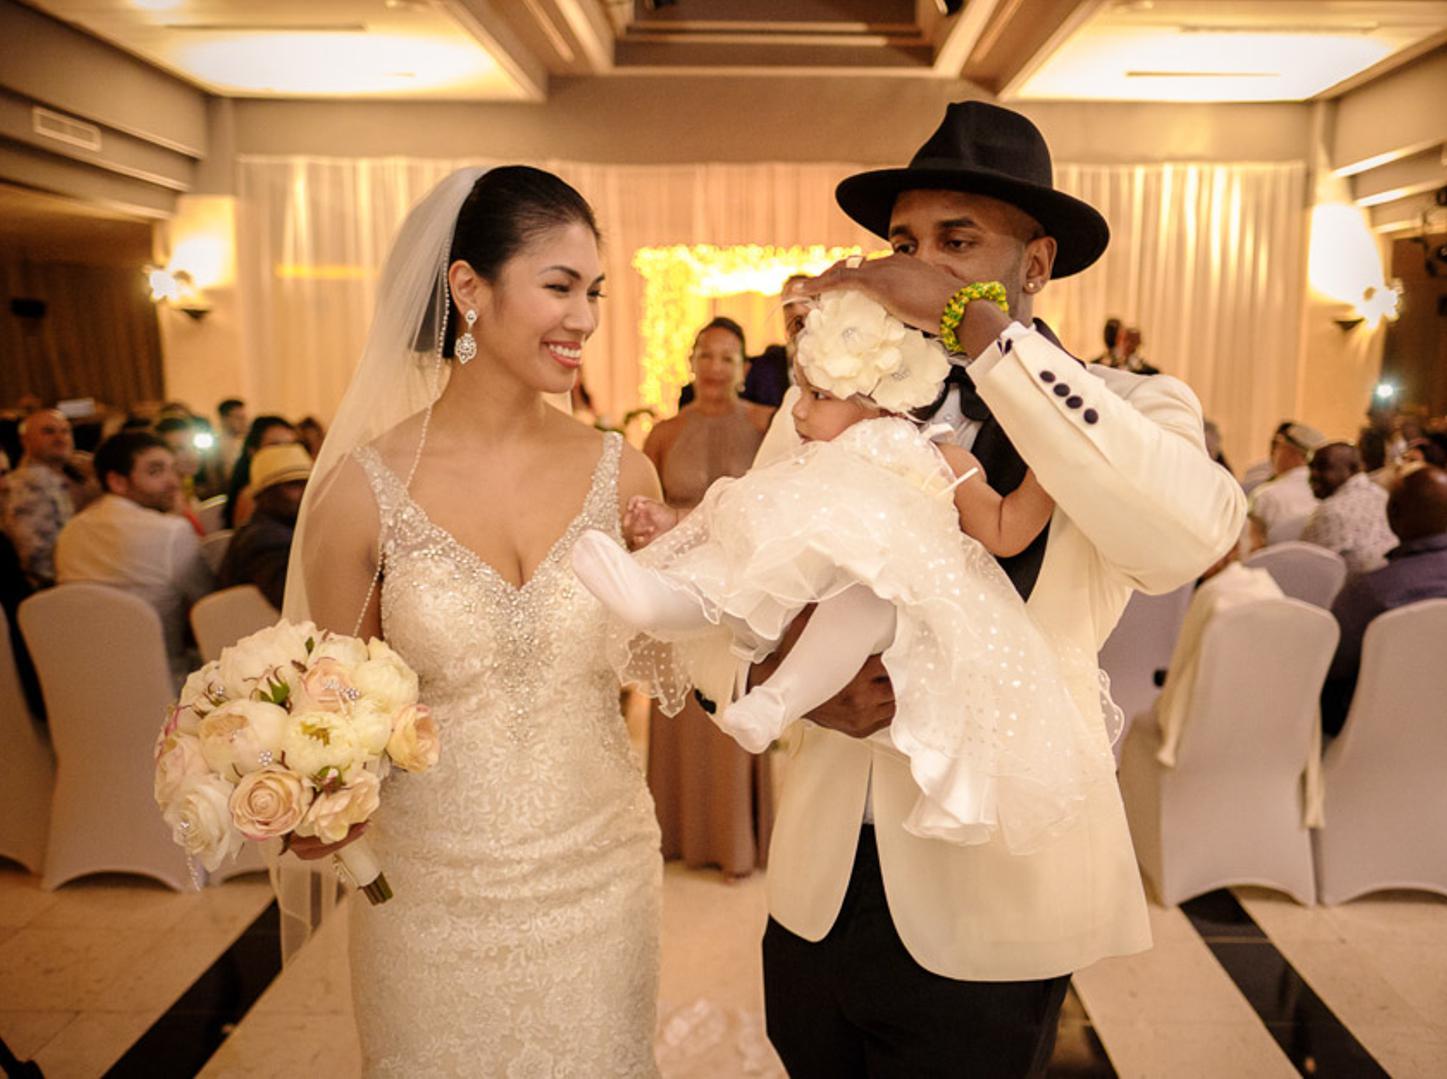 bodas-sin-clasificar-sin-tema-cuba-41431.jpg